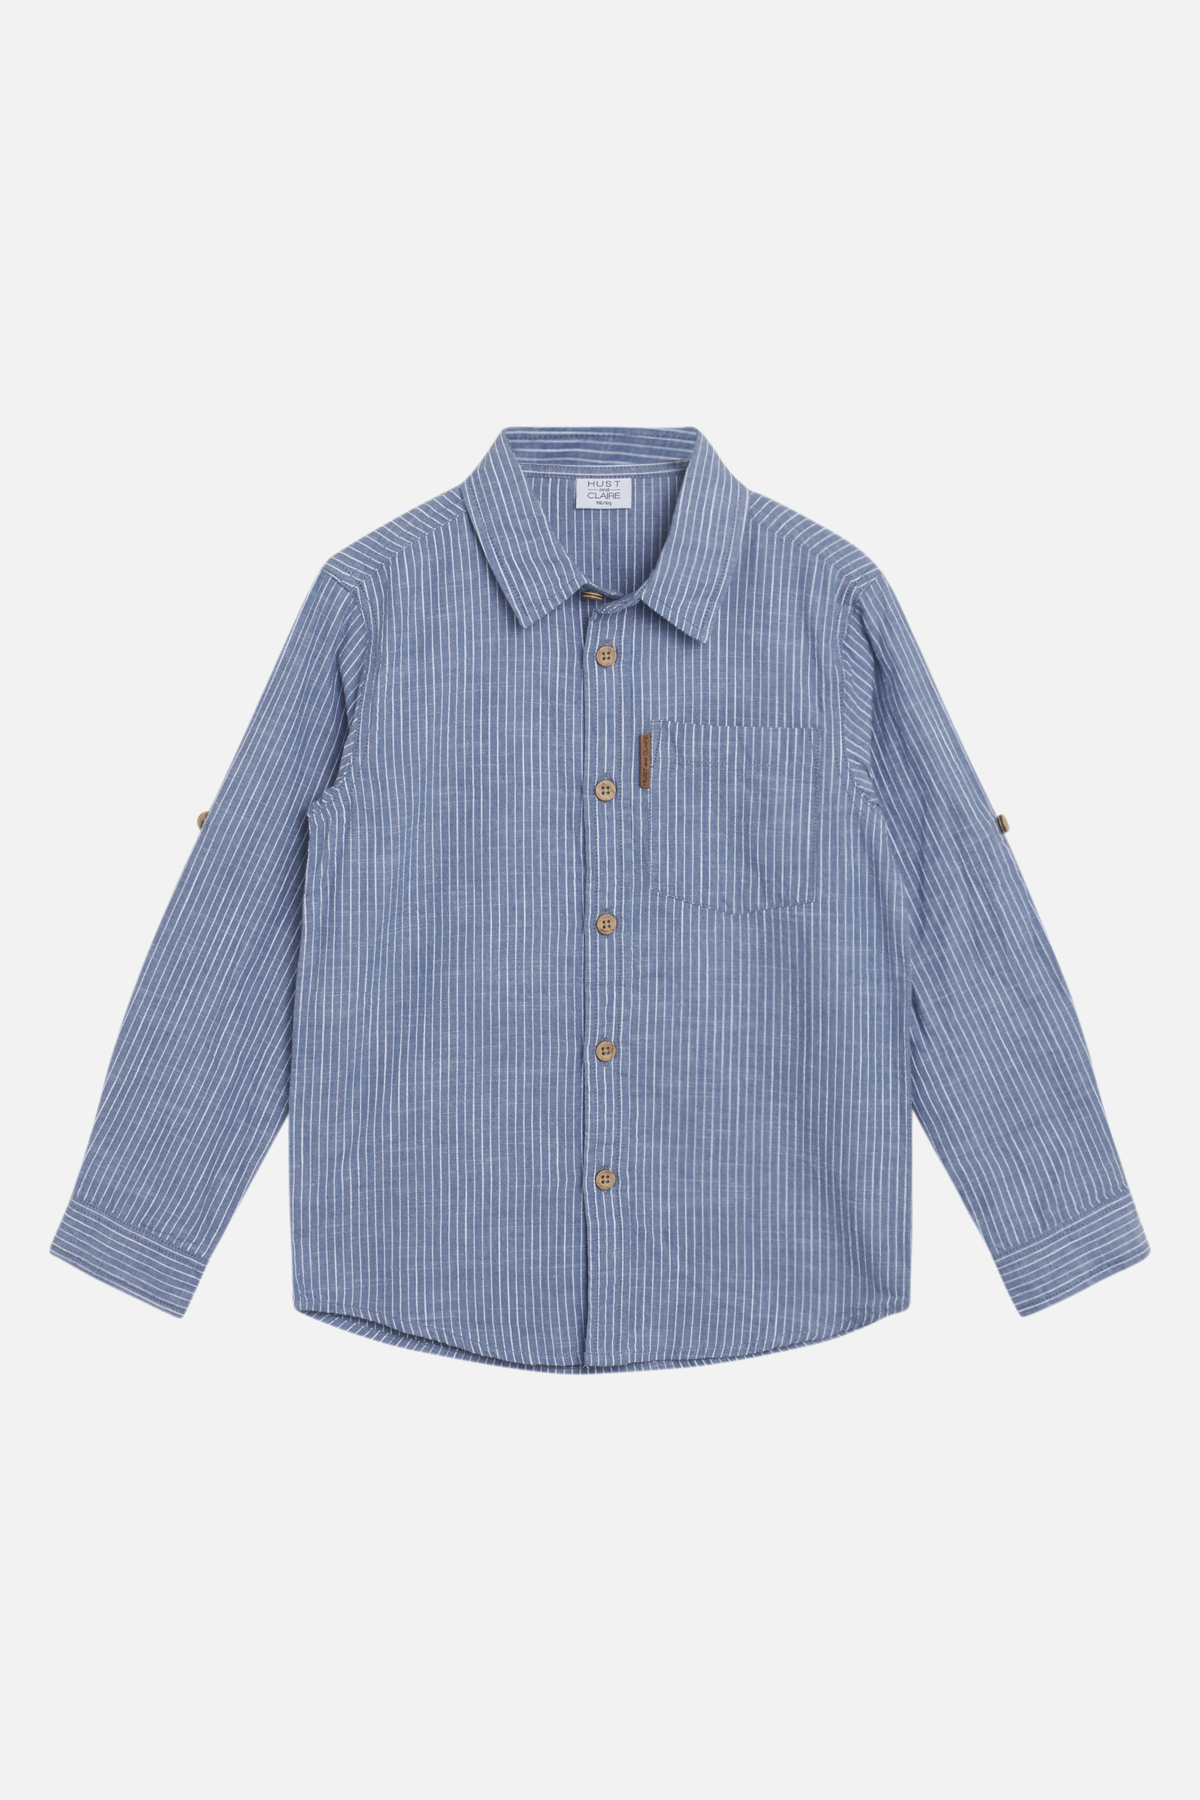 Uni - Rollo - Shirt